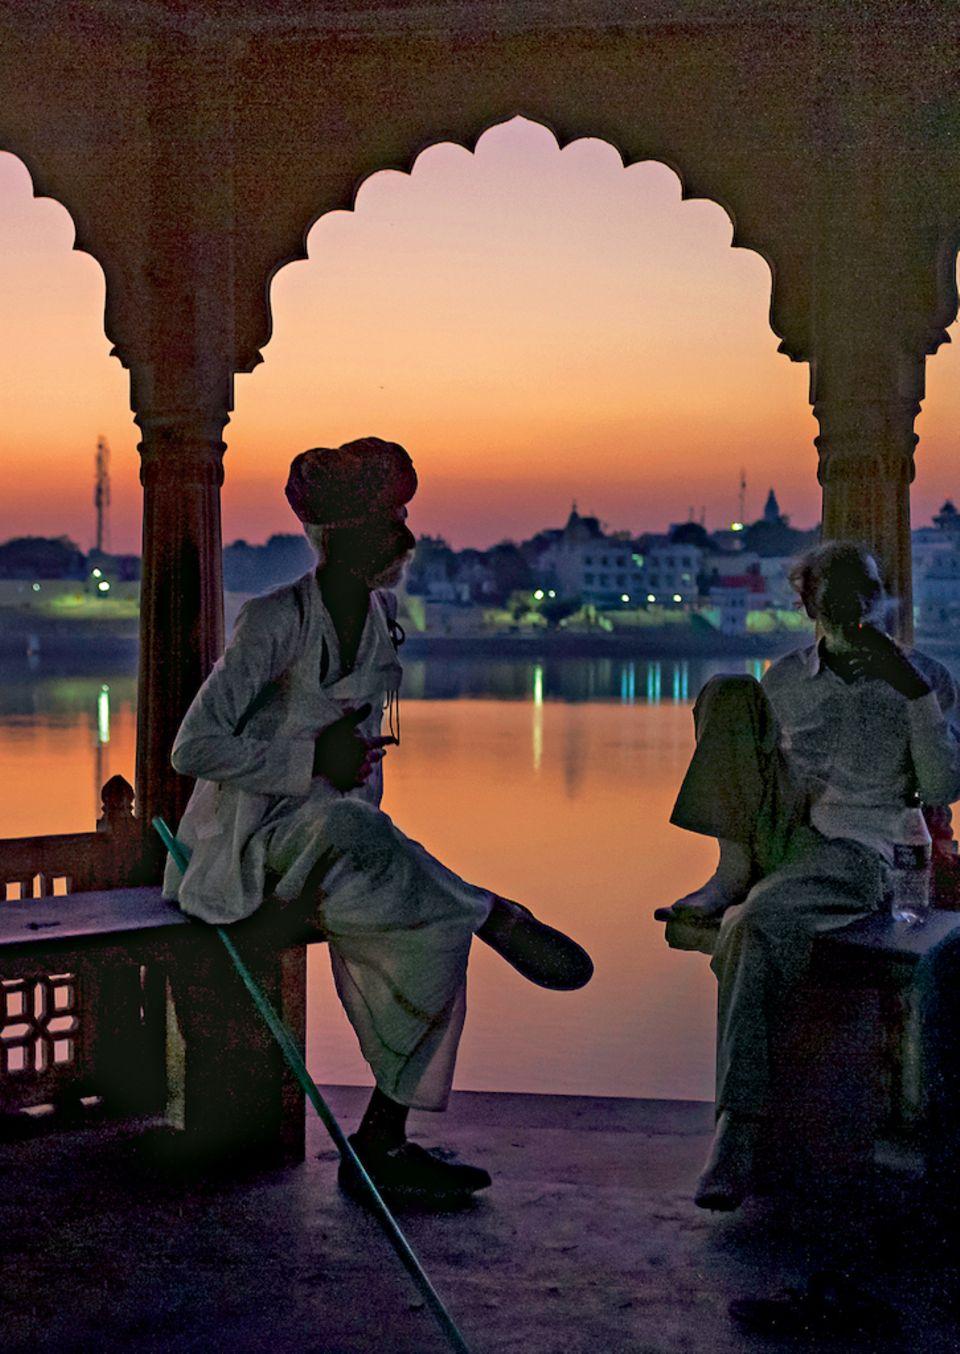 Rajasthan: Sonnenuntergang am heiligen See in Pushkar